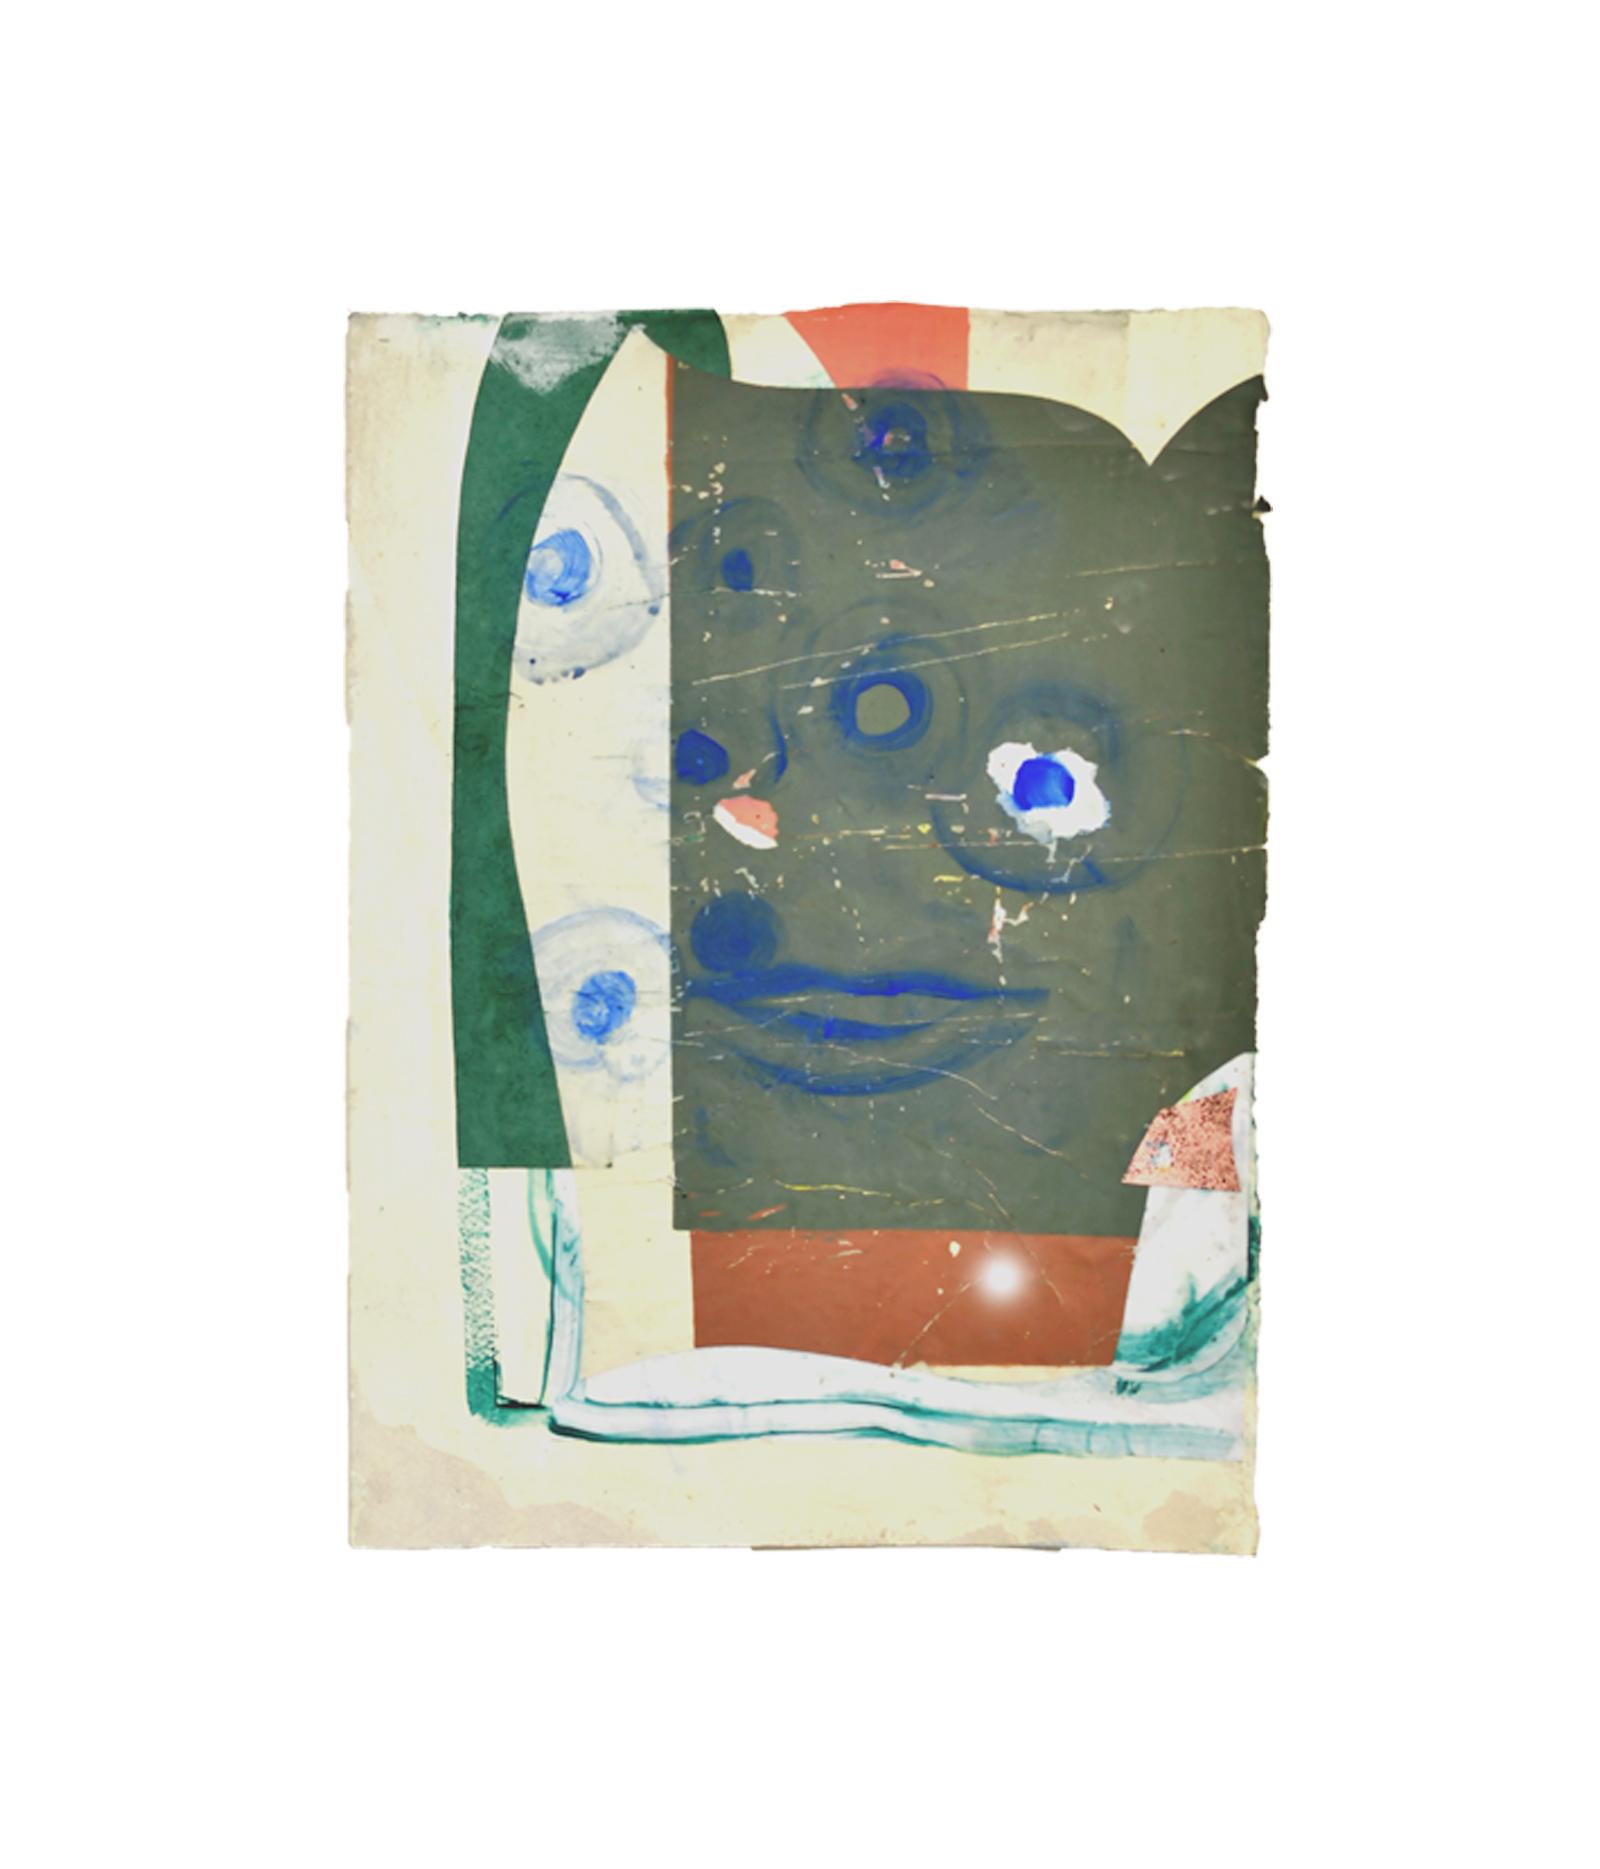 Friend Collage on paper, H 40 cm x W 30 cm 2018